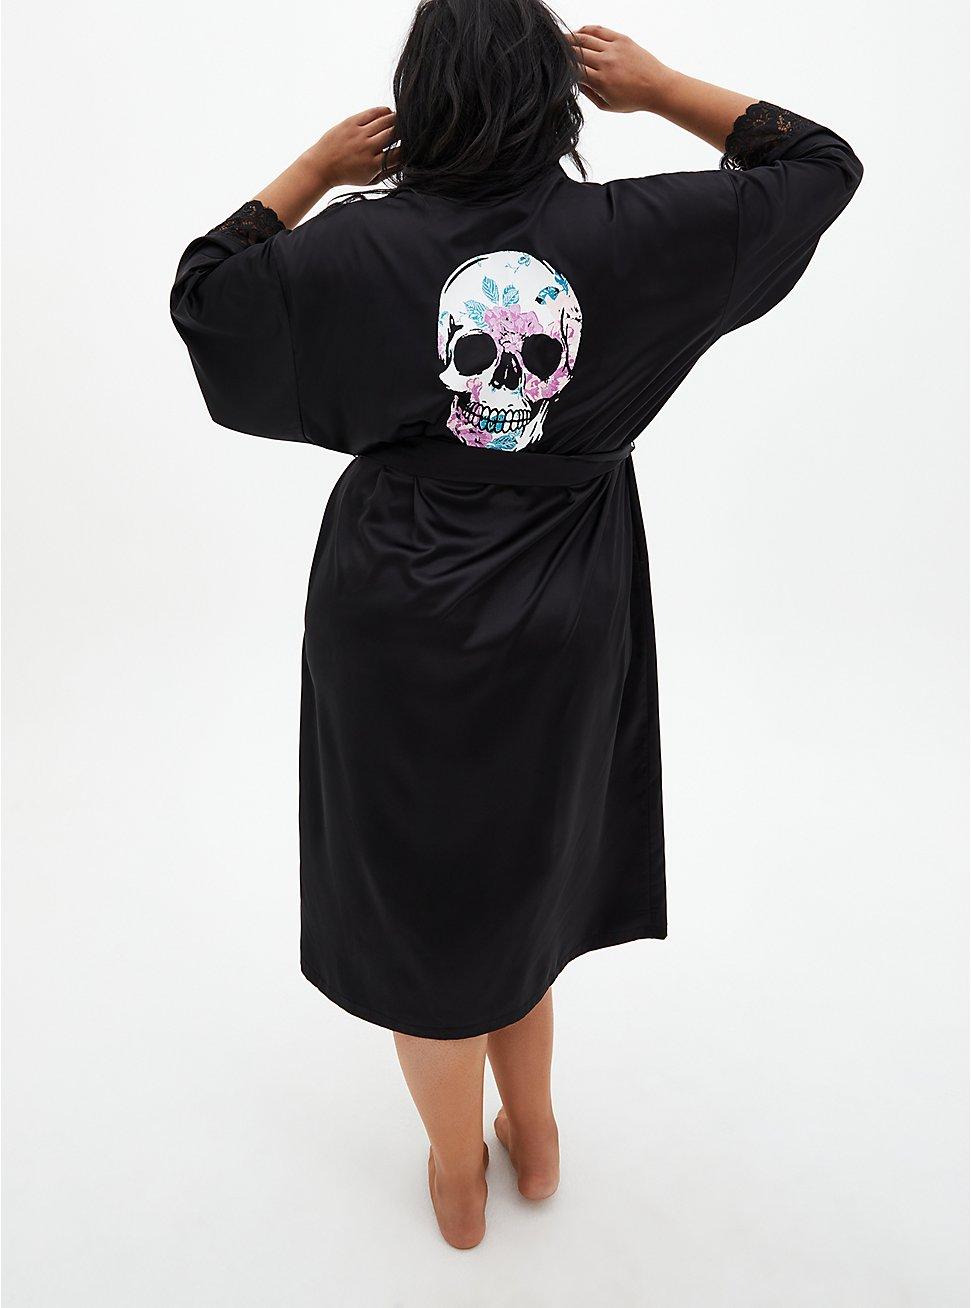 Black Skull Floral Full Length Robe, RICH BLACK, hi-res